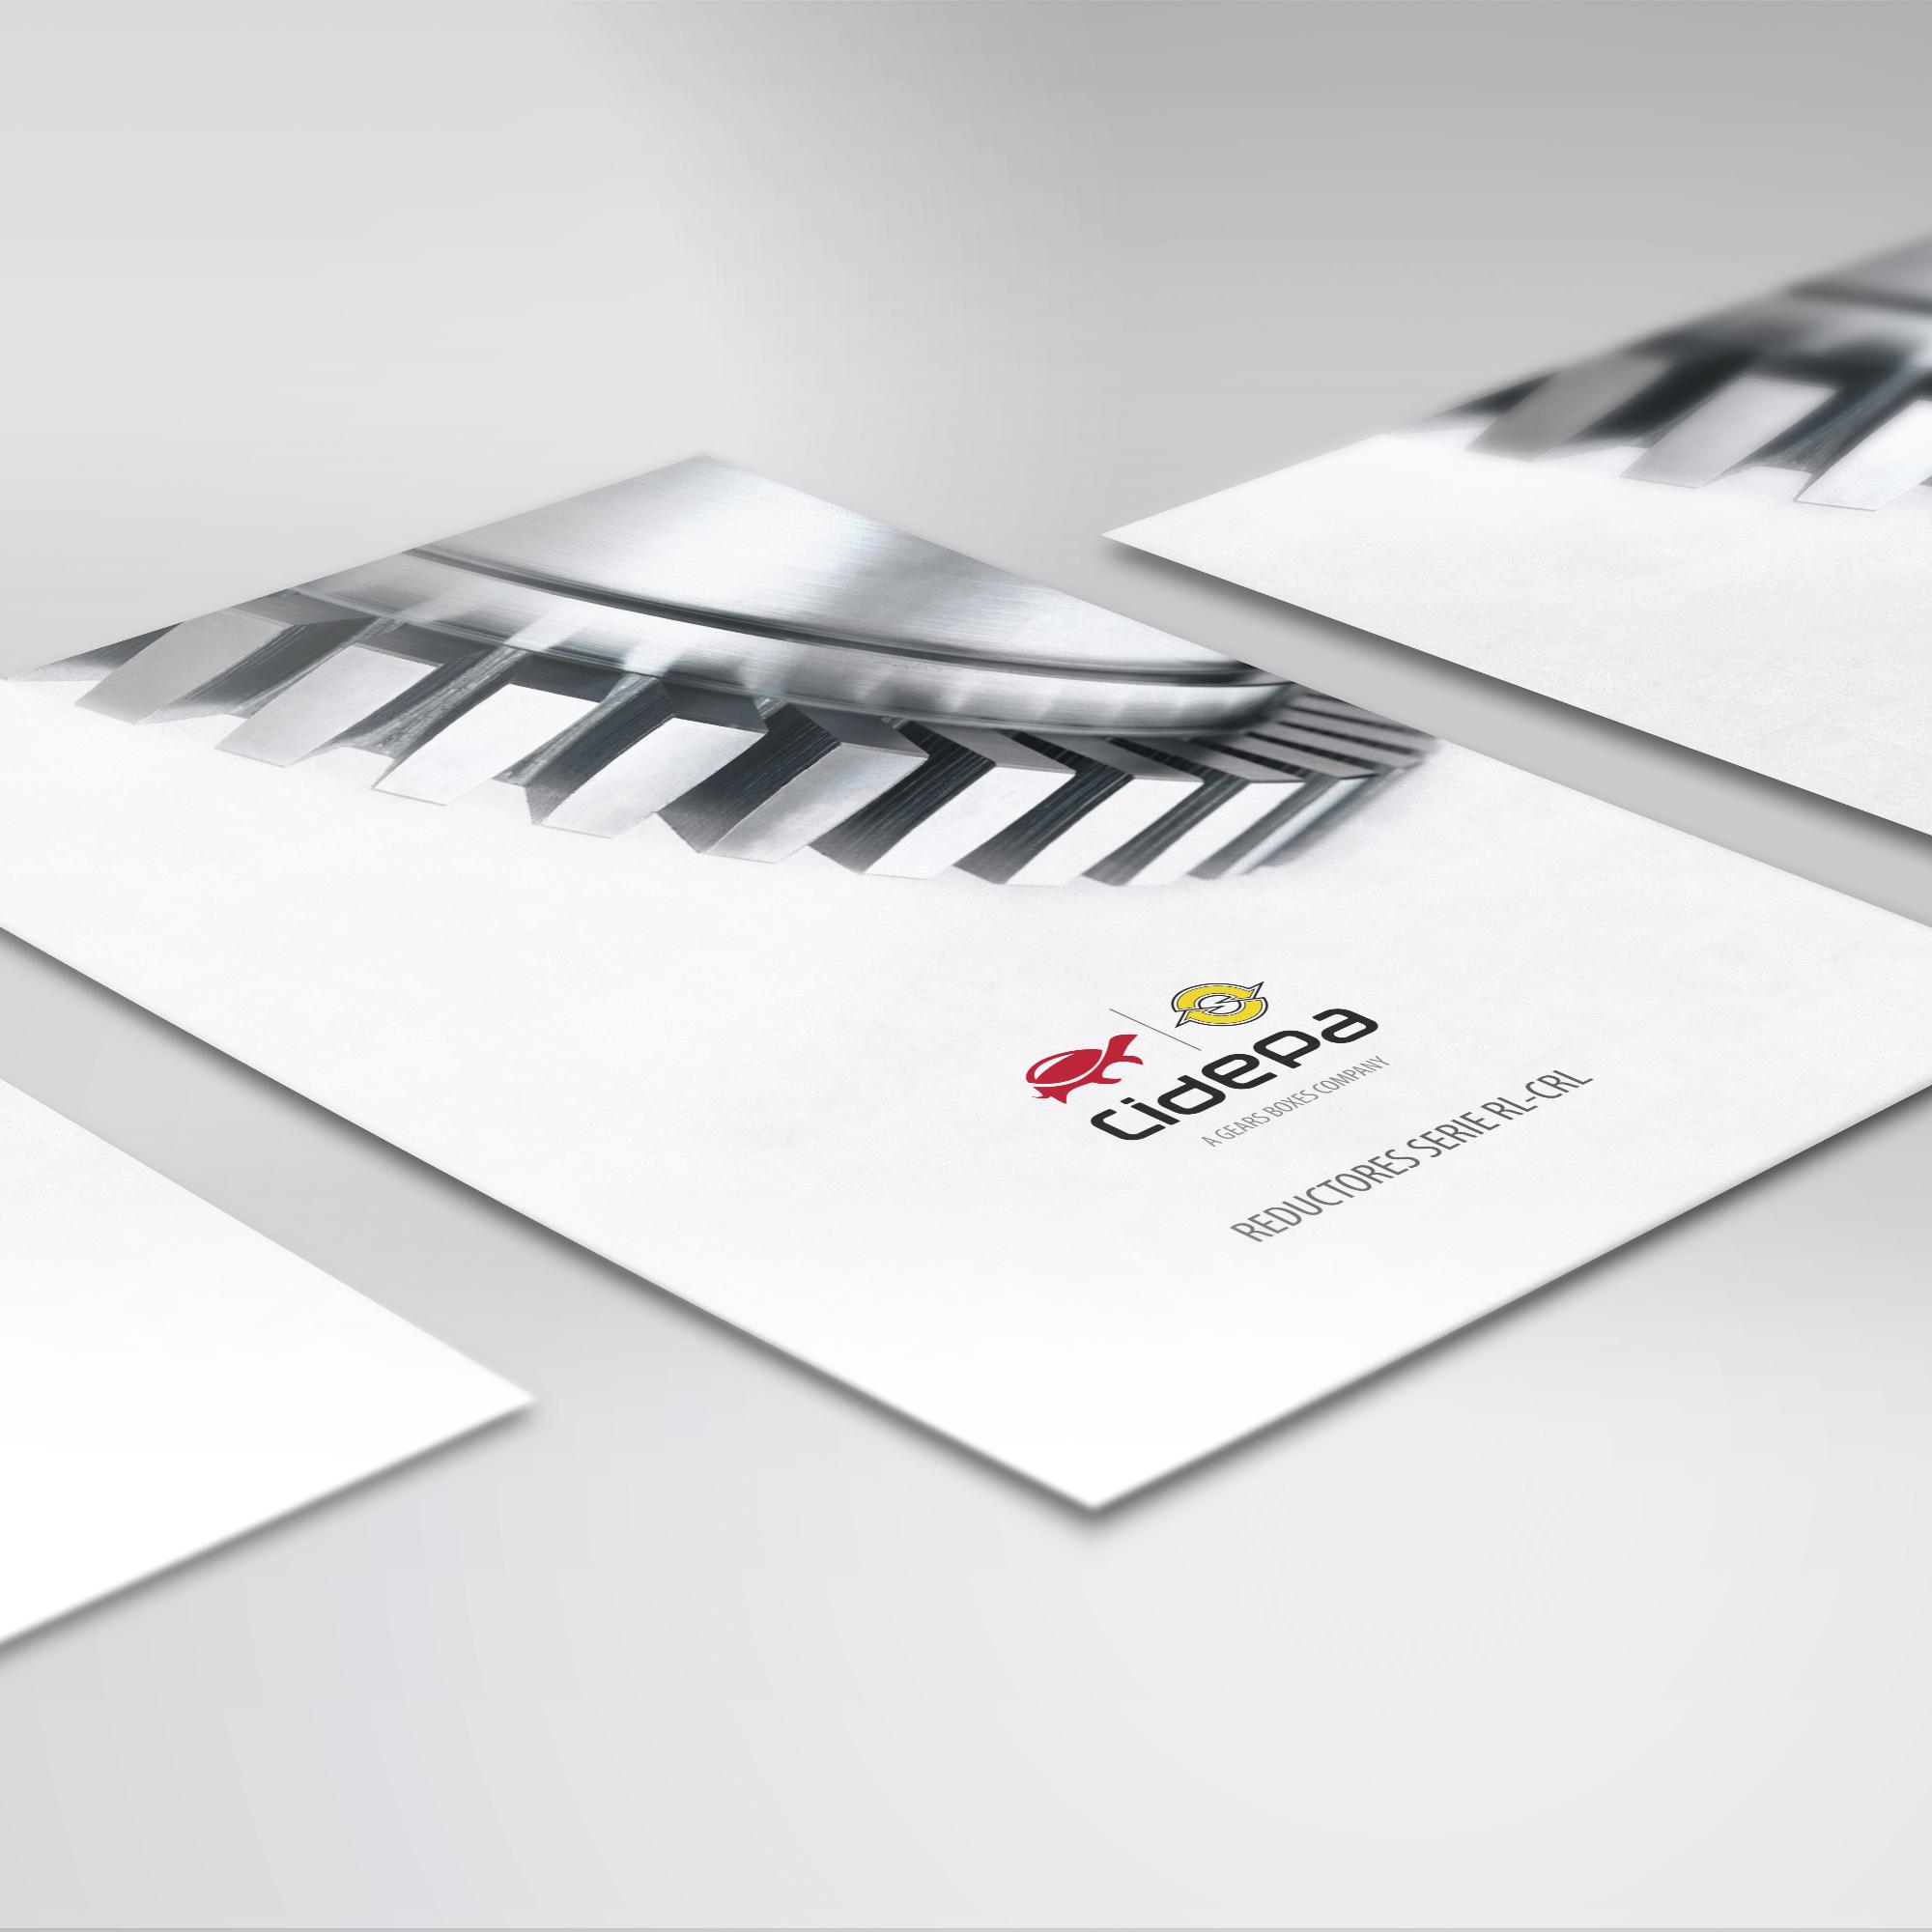 catalogo_cidepa_motoreductores_textura_design